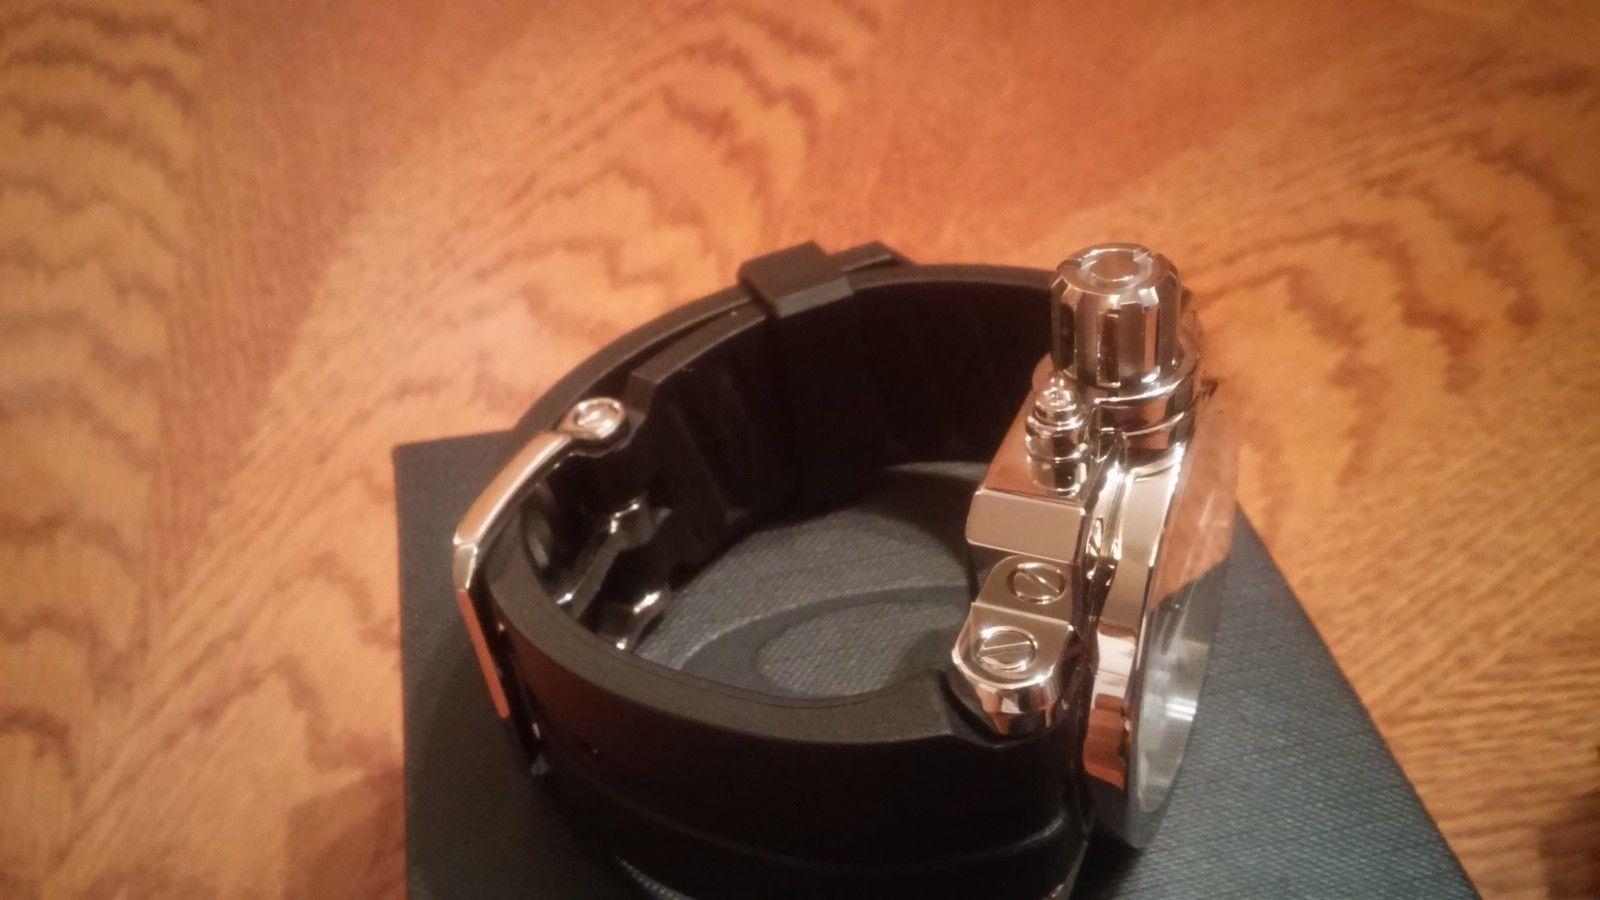 Oakley polished black/white gearbox(bnib) - 20150706_090230_HDR.jpg